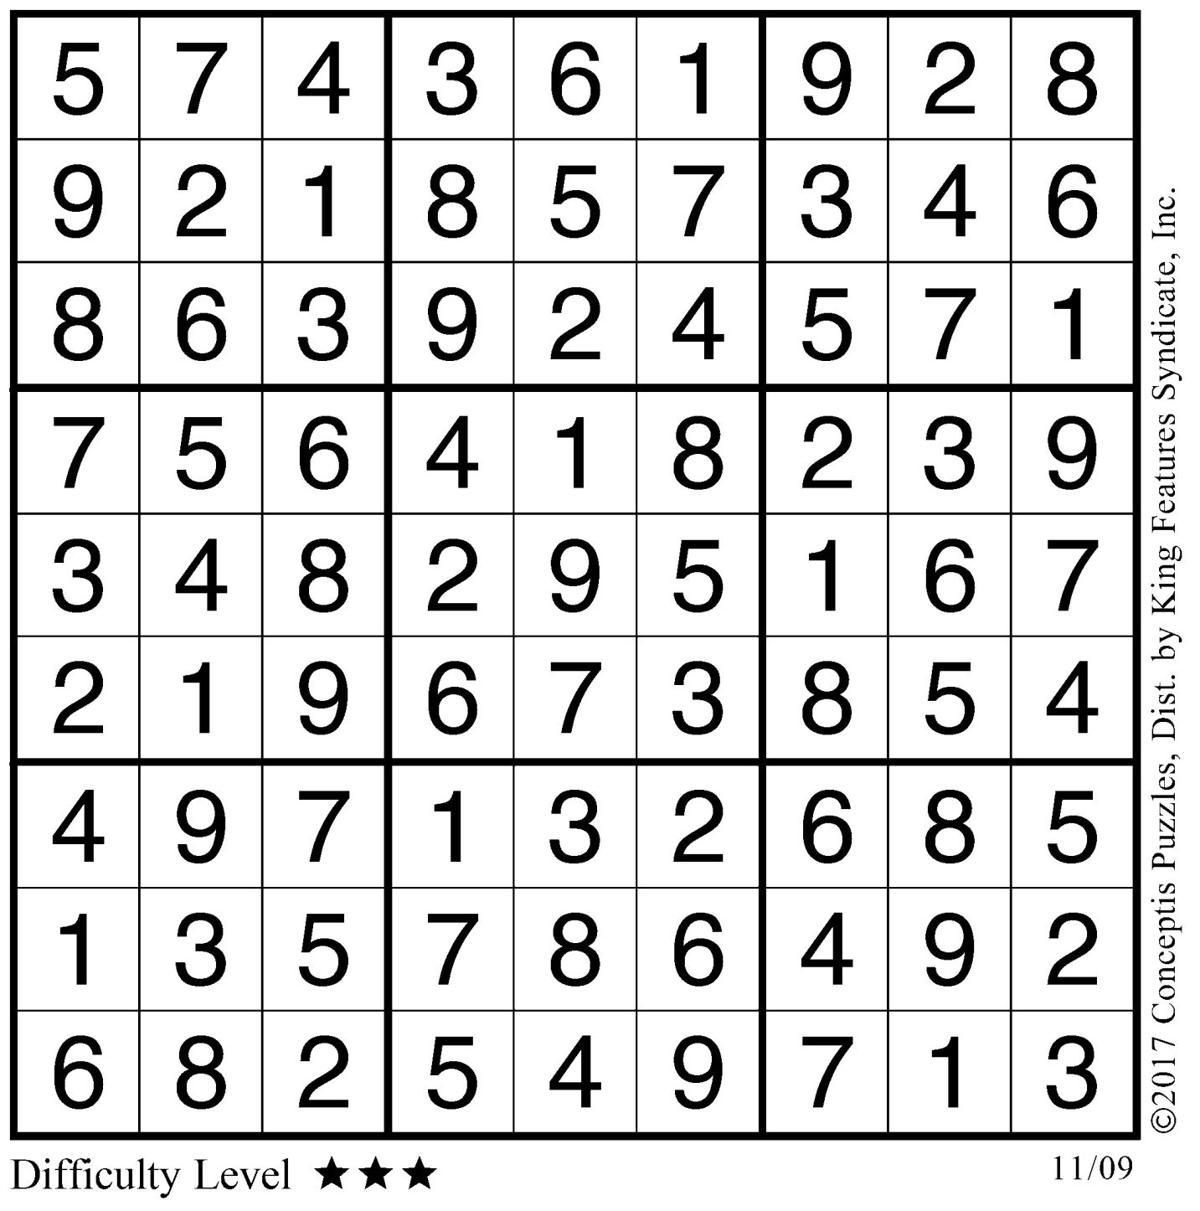 November 9 Sudoku 2